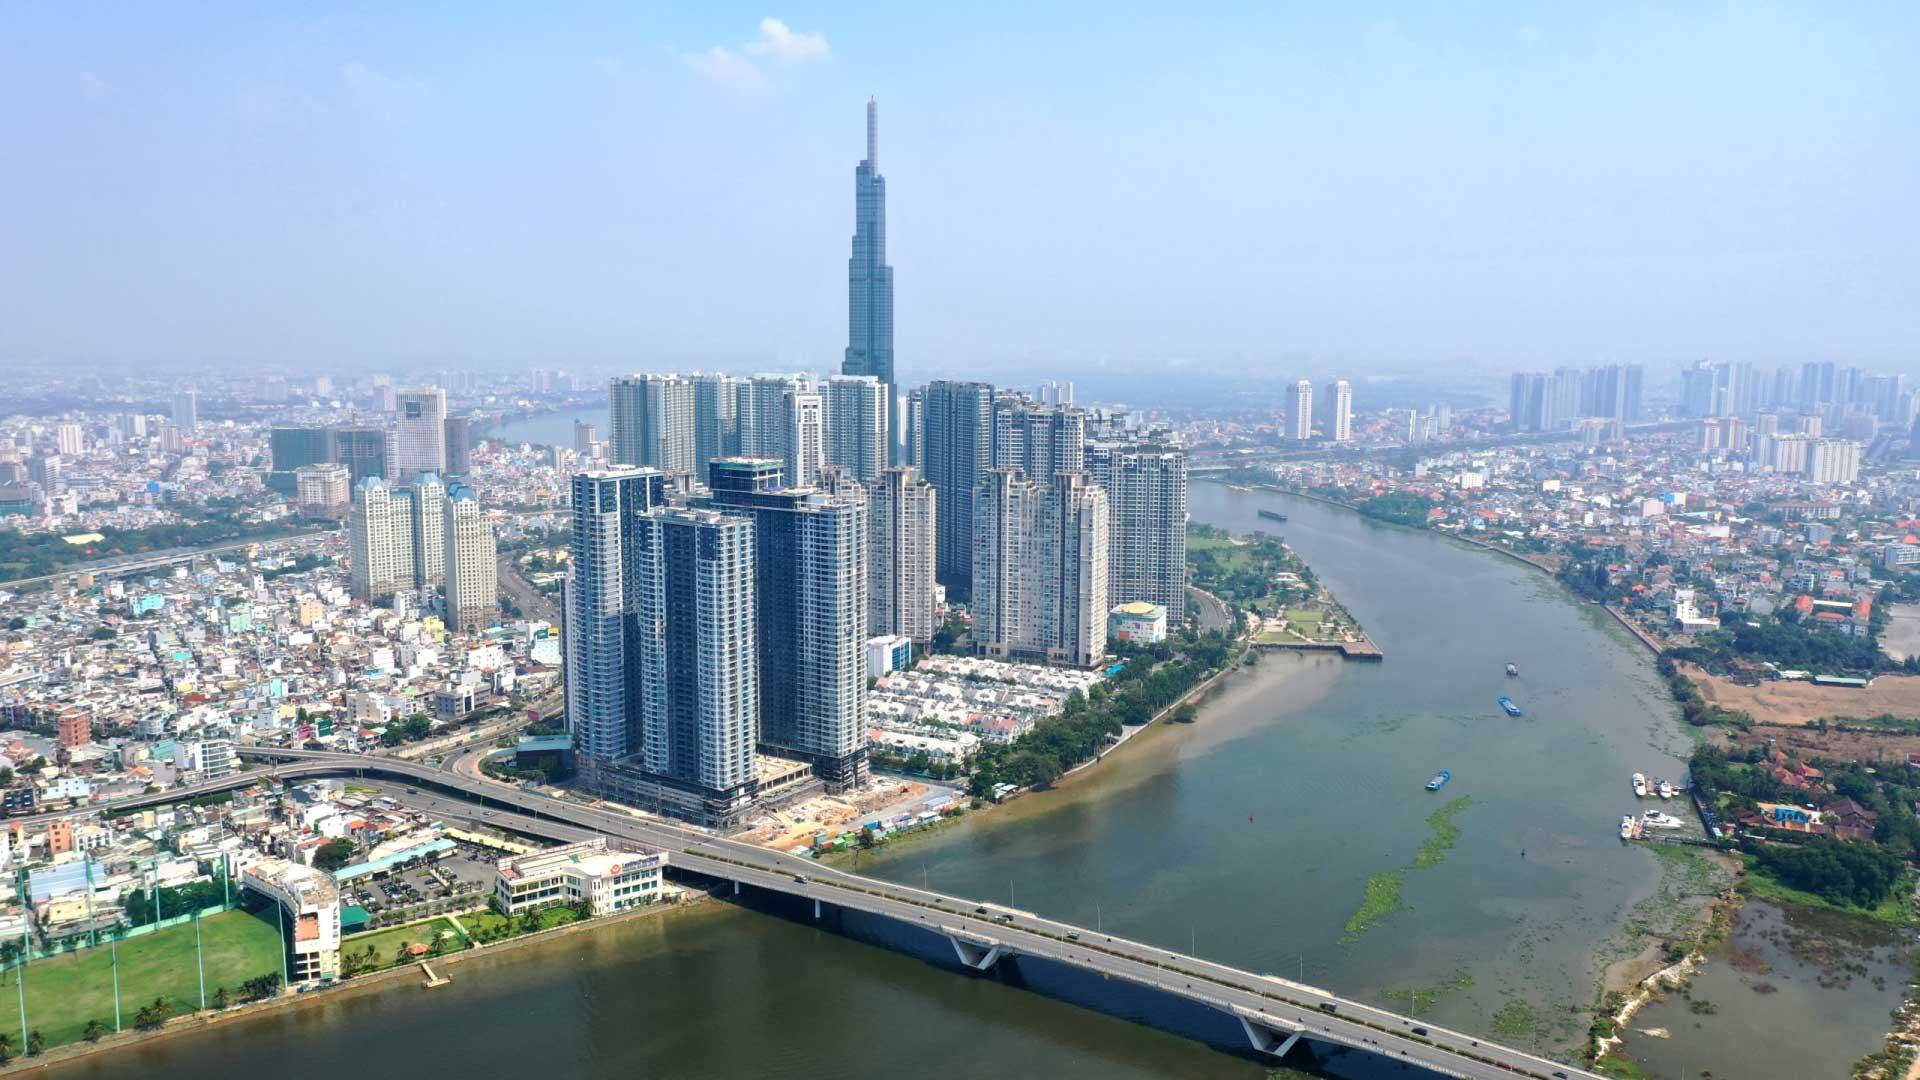 The River Thủ Thiêm Quận 2